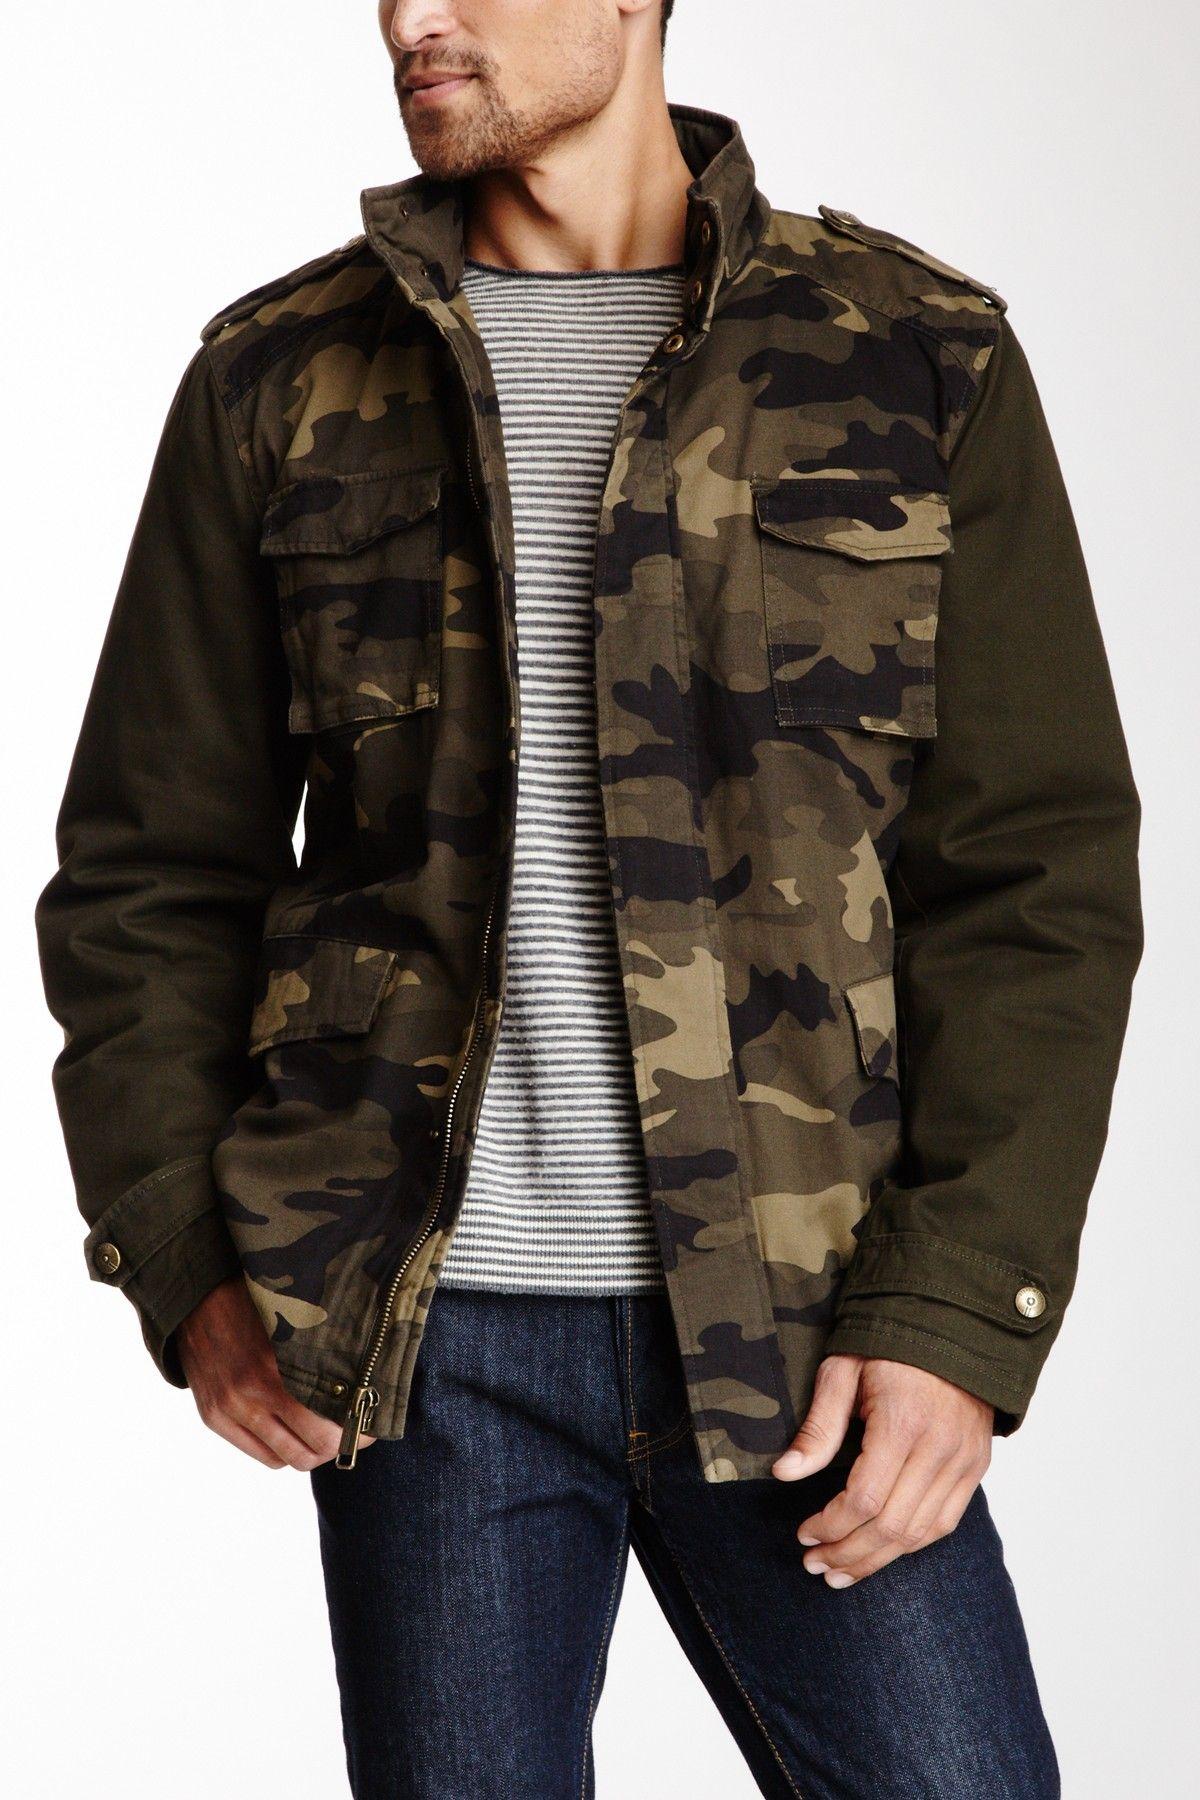 Steve Madden Limited Twill Jacket Jacketmen Outerwear Twill Jacket Jackets Fashion [ 1800 x 1200 Pixel ]